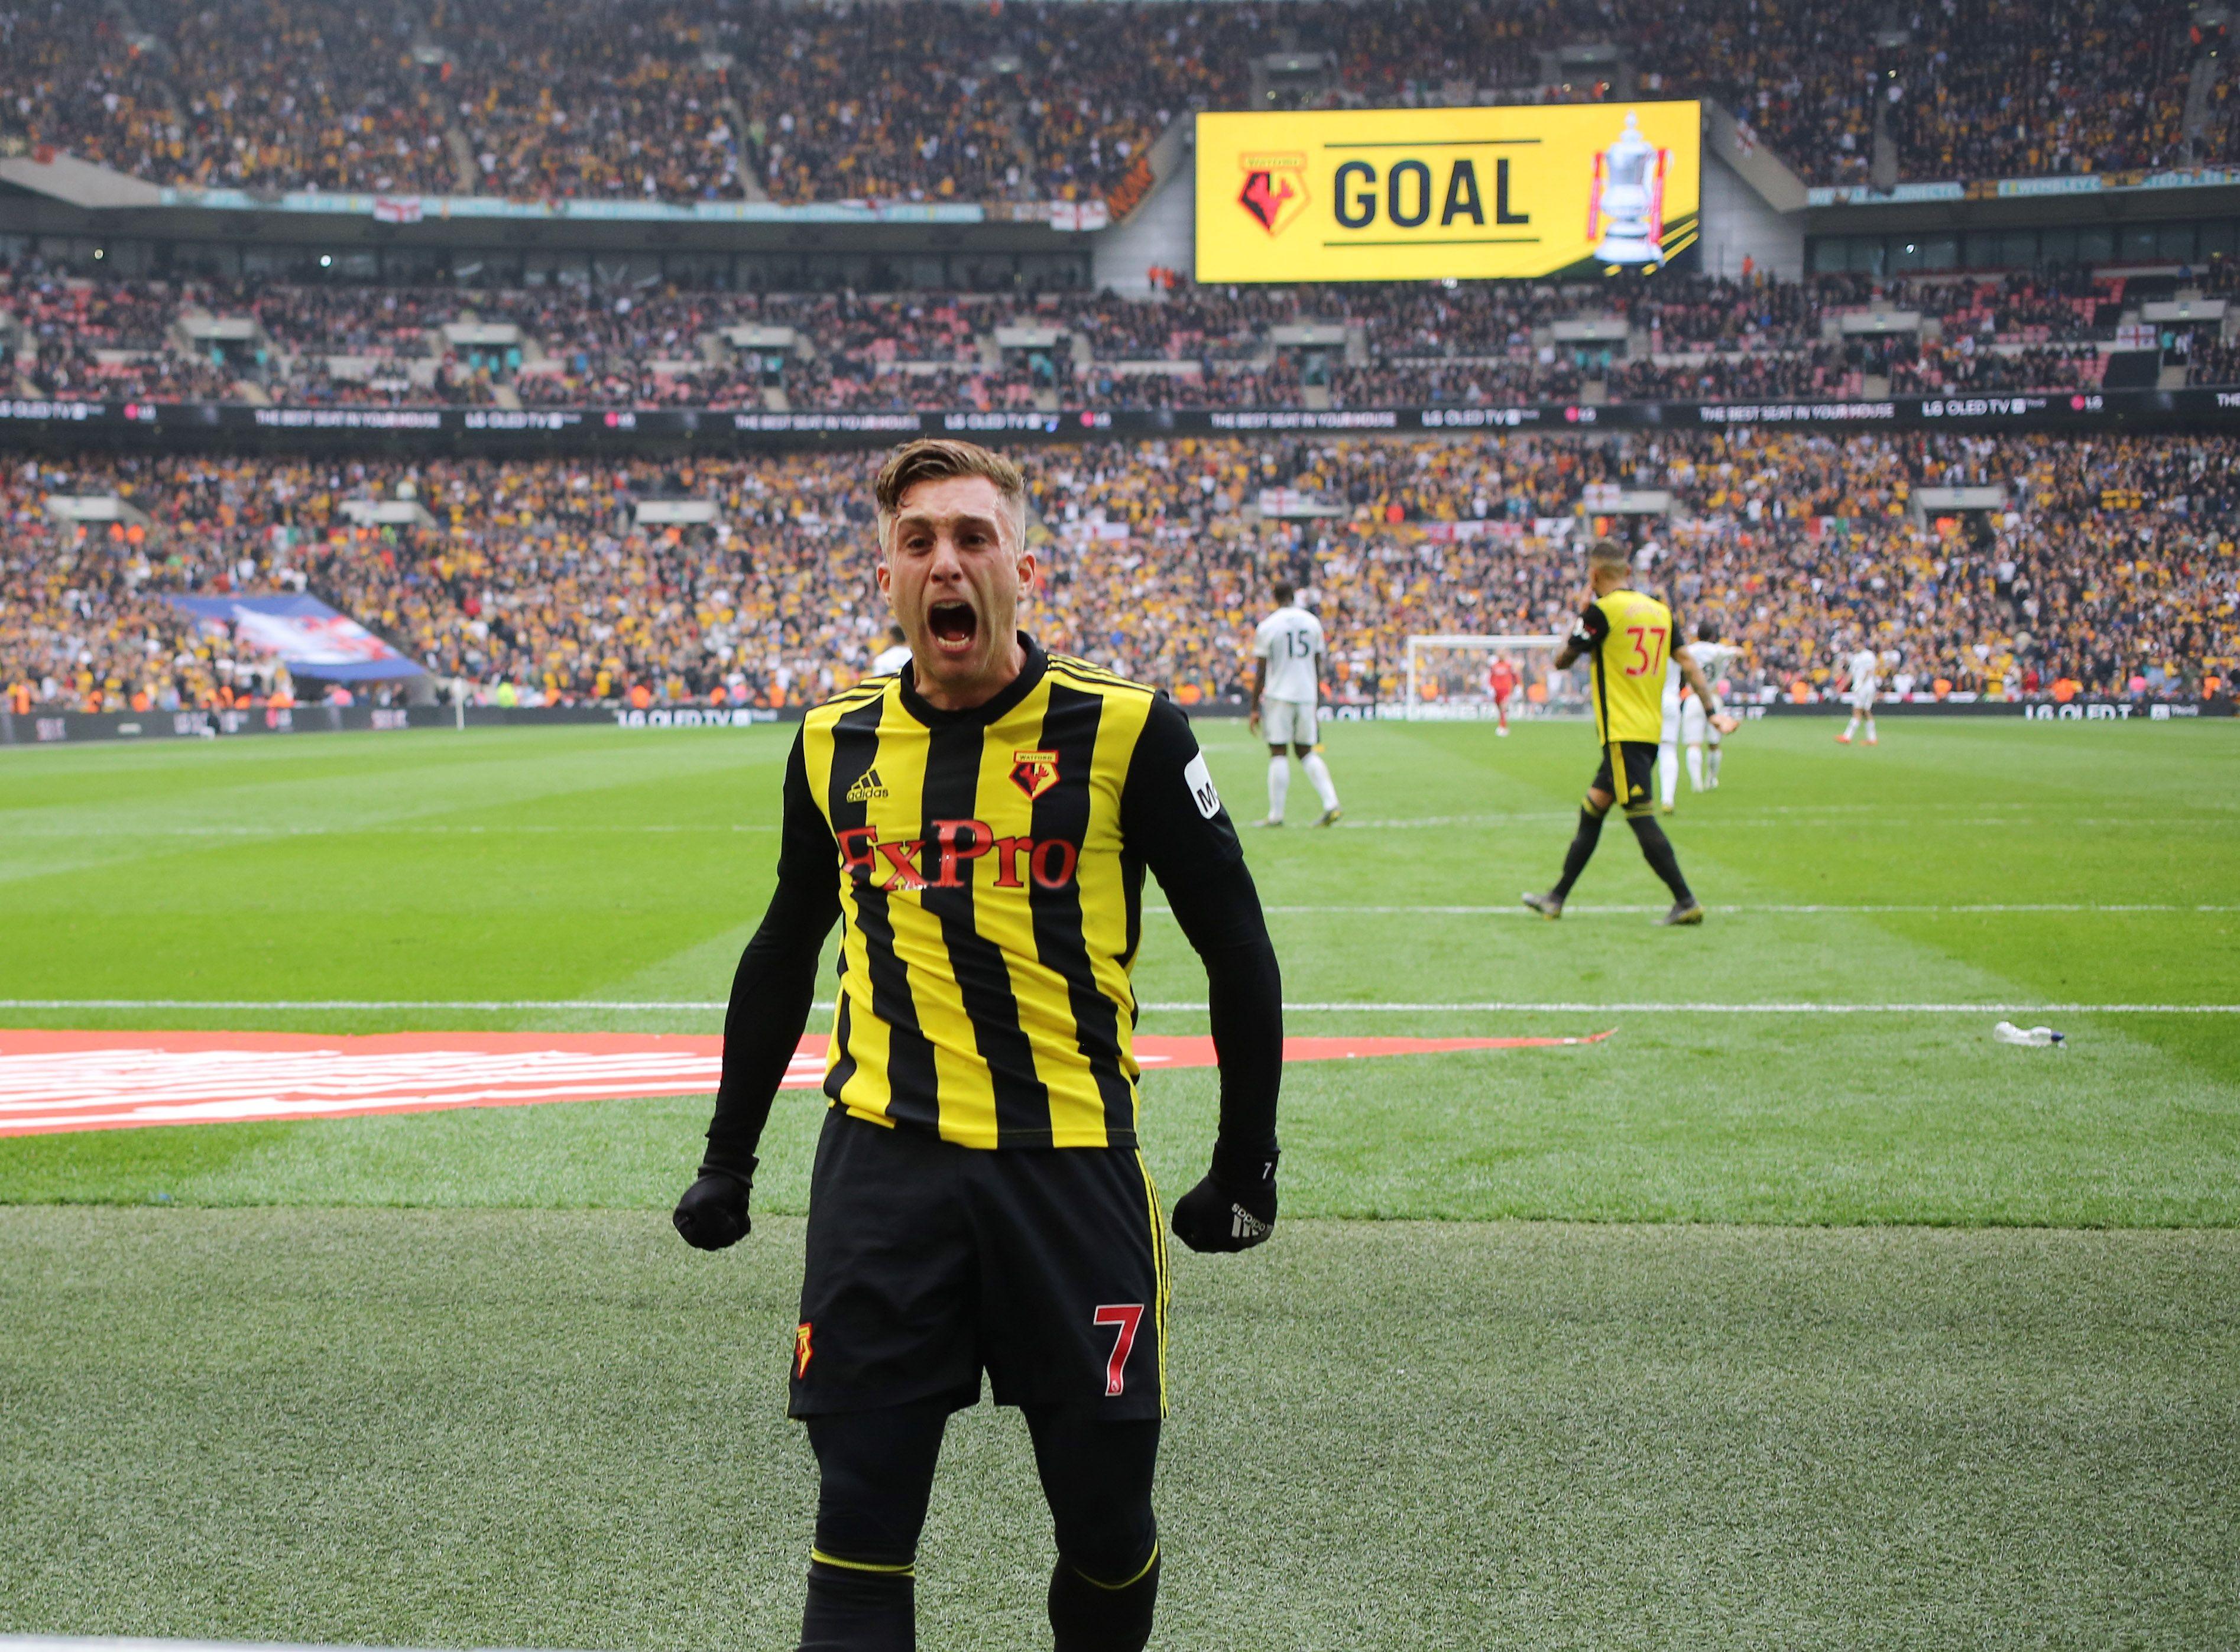 Gerard Deulofeu of Watford celebrates the equalising goal for Watford